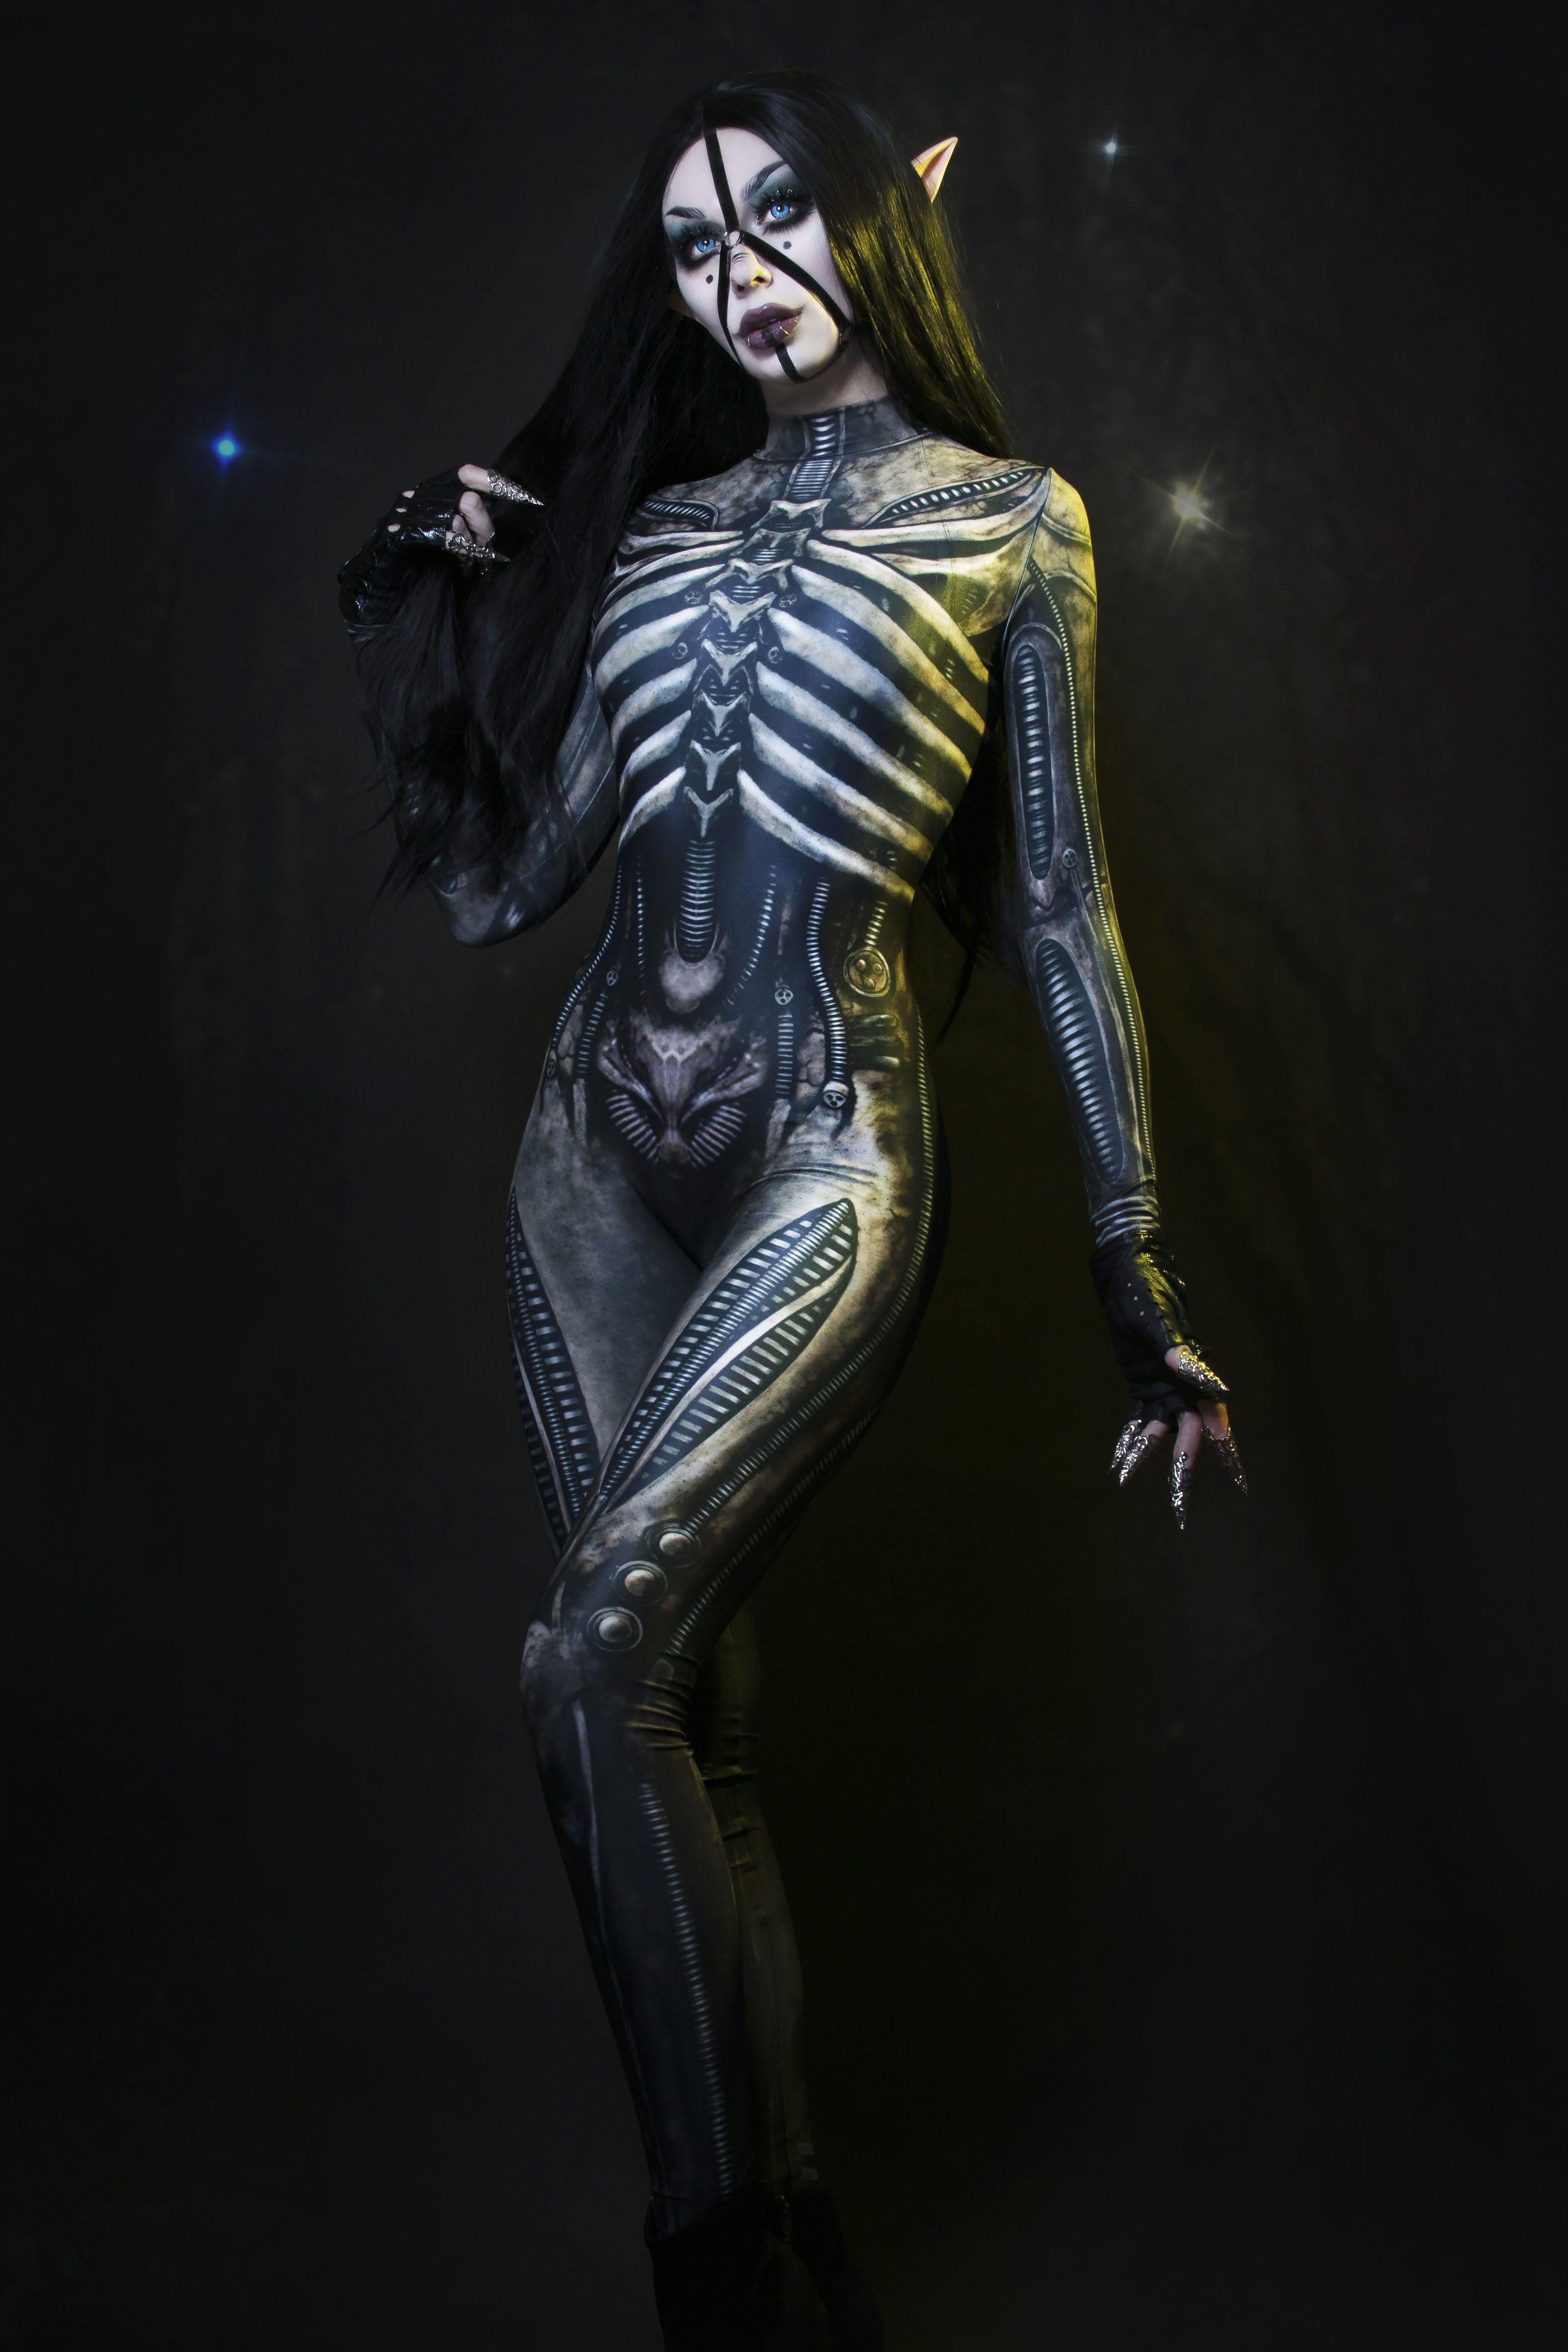 Xenomorph Costume in 2020 Xenomorph costume, Halloween